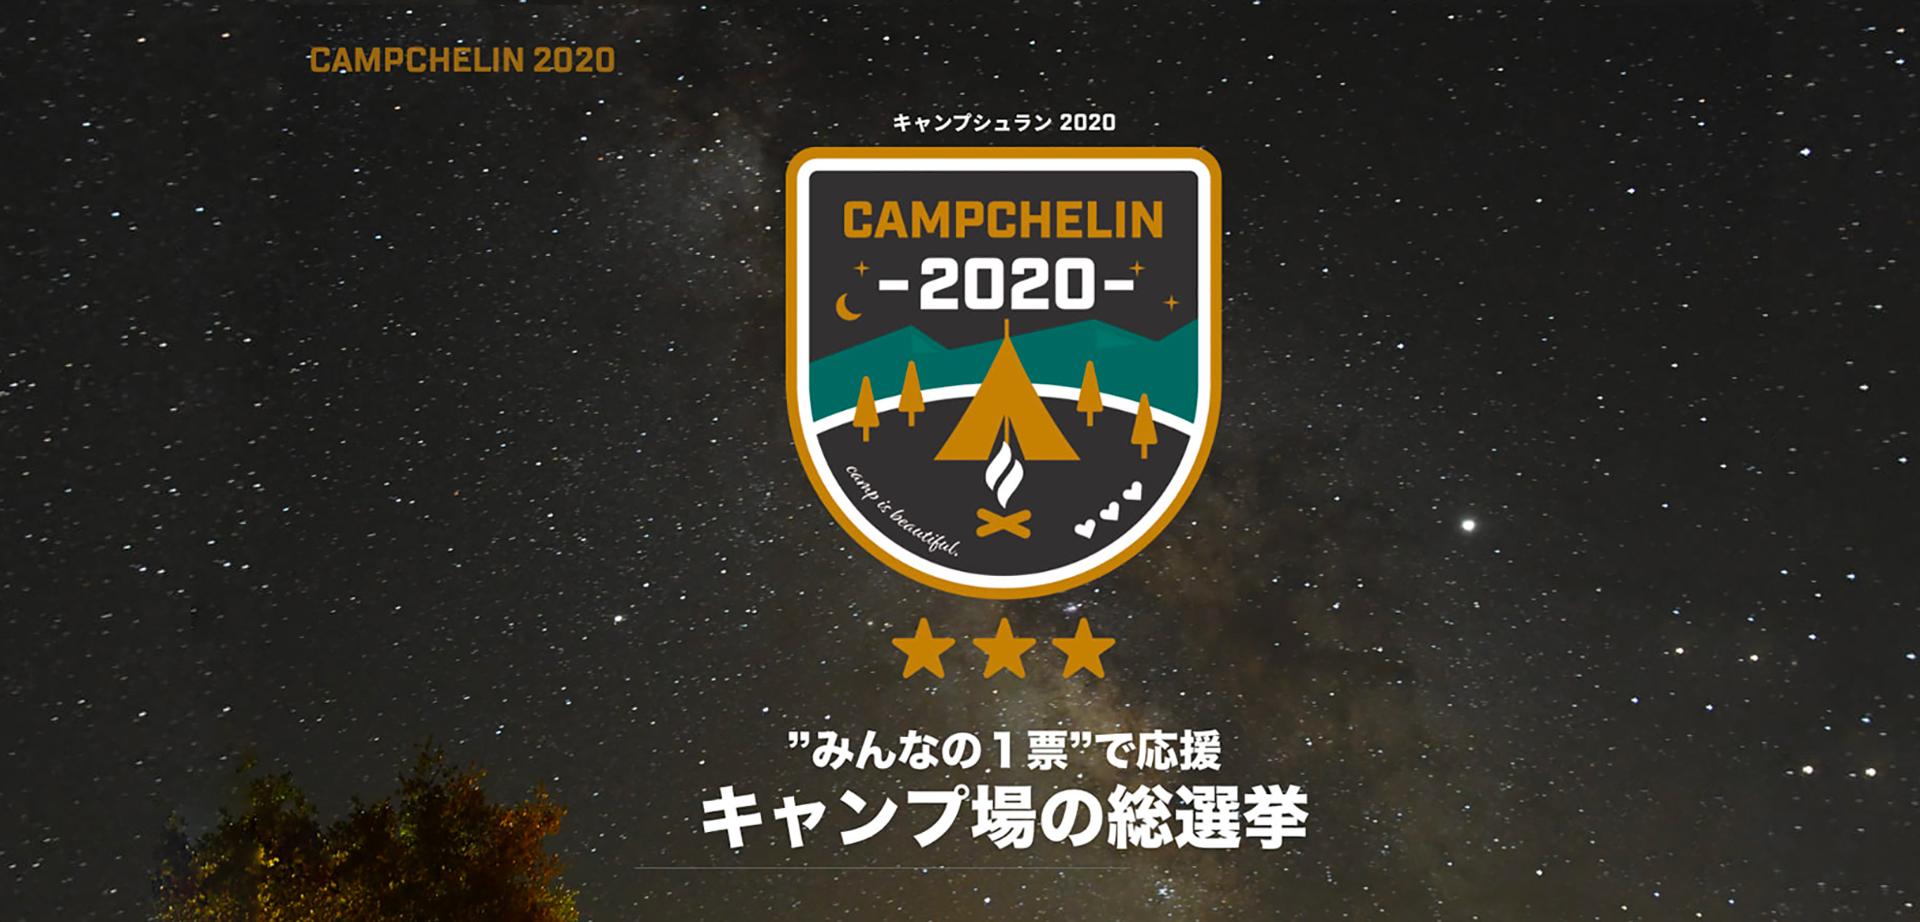 #CAMPCHELIN「キャンプシュラン2020」